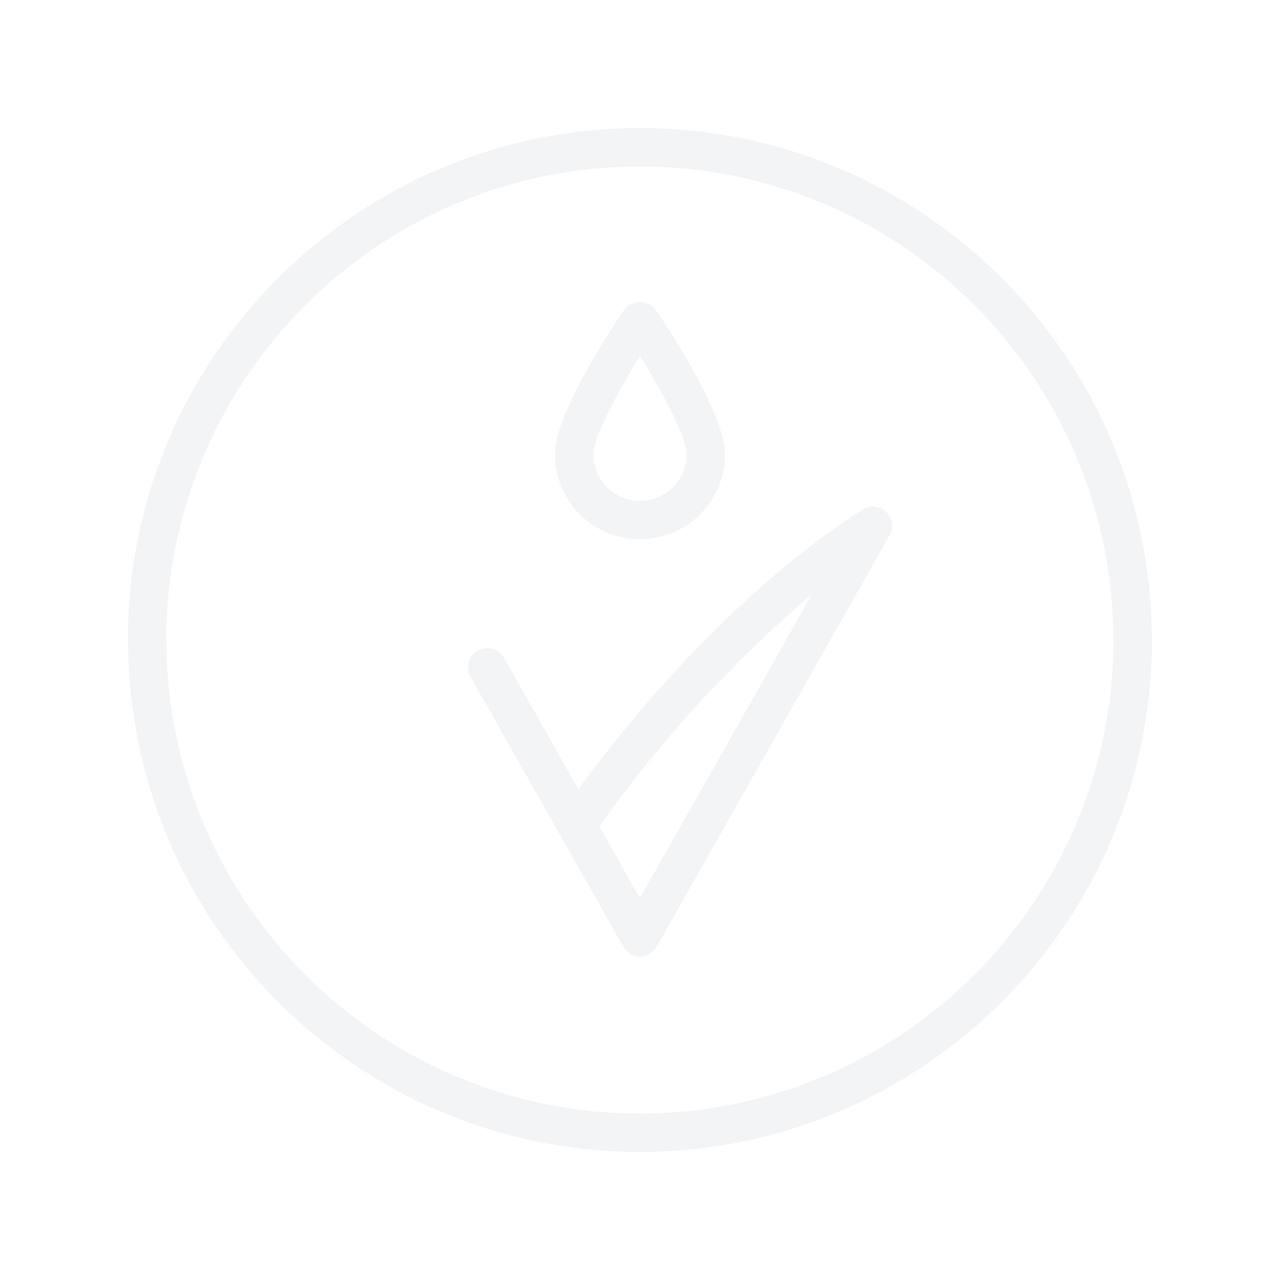 CHI Royal Treatment Brilliance Cream крем для эластичной укладки 177ml